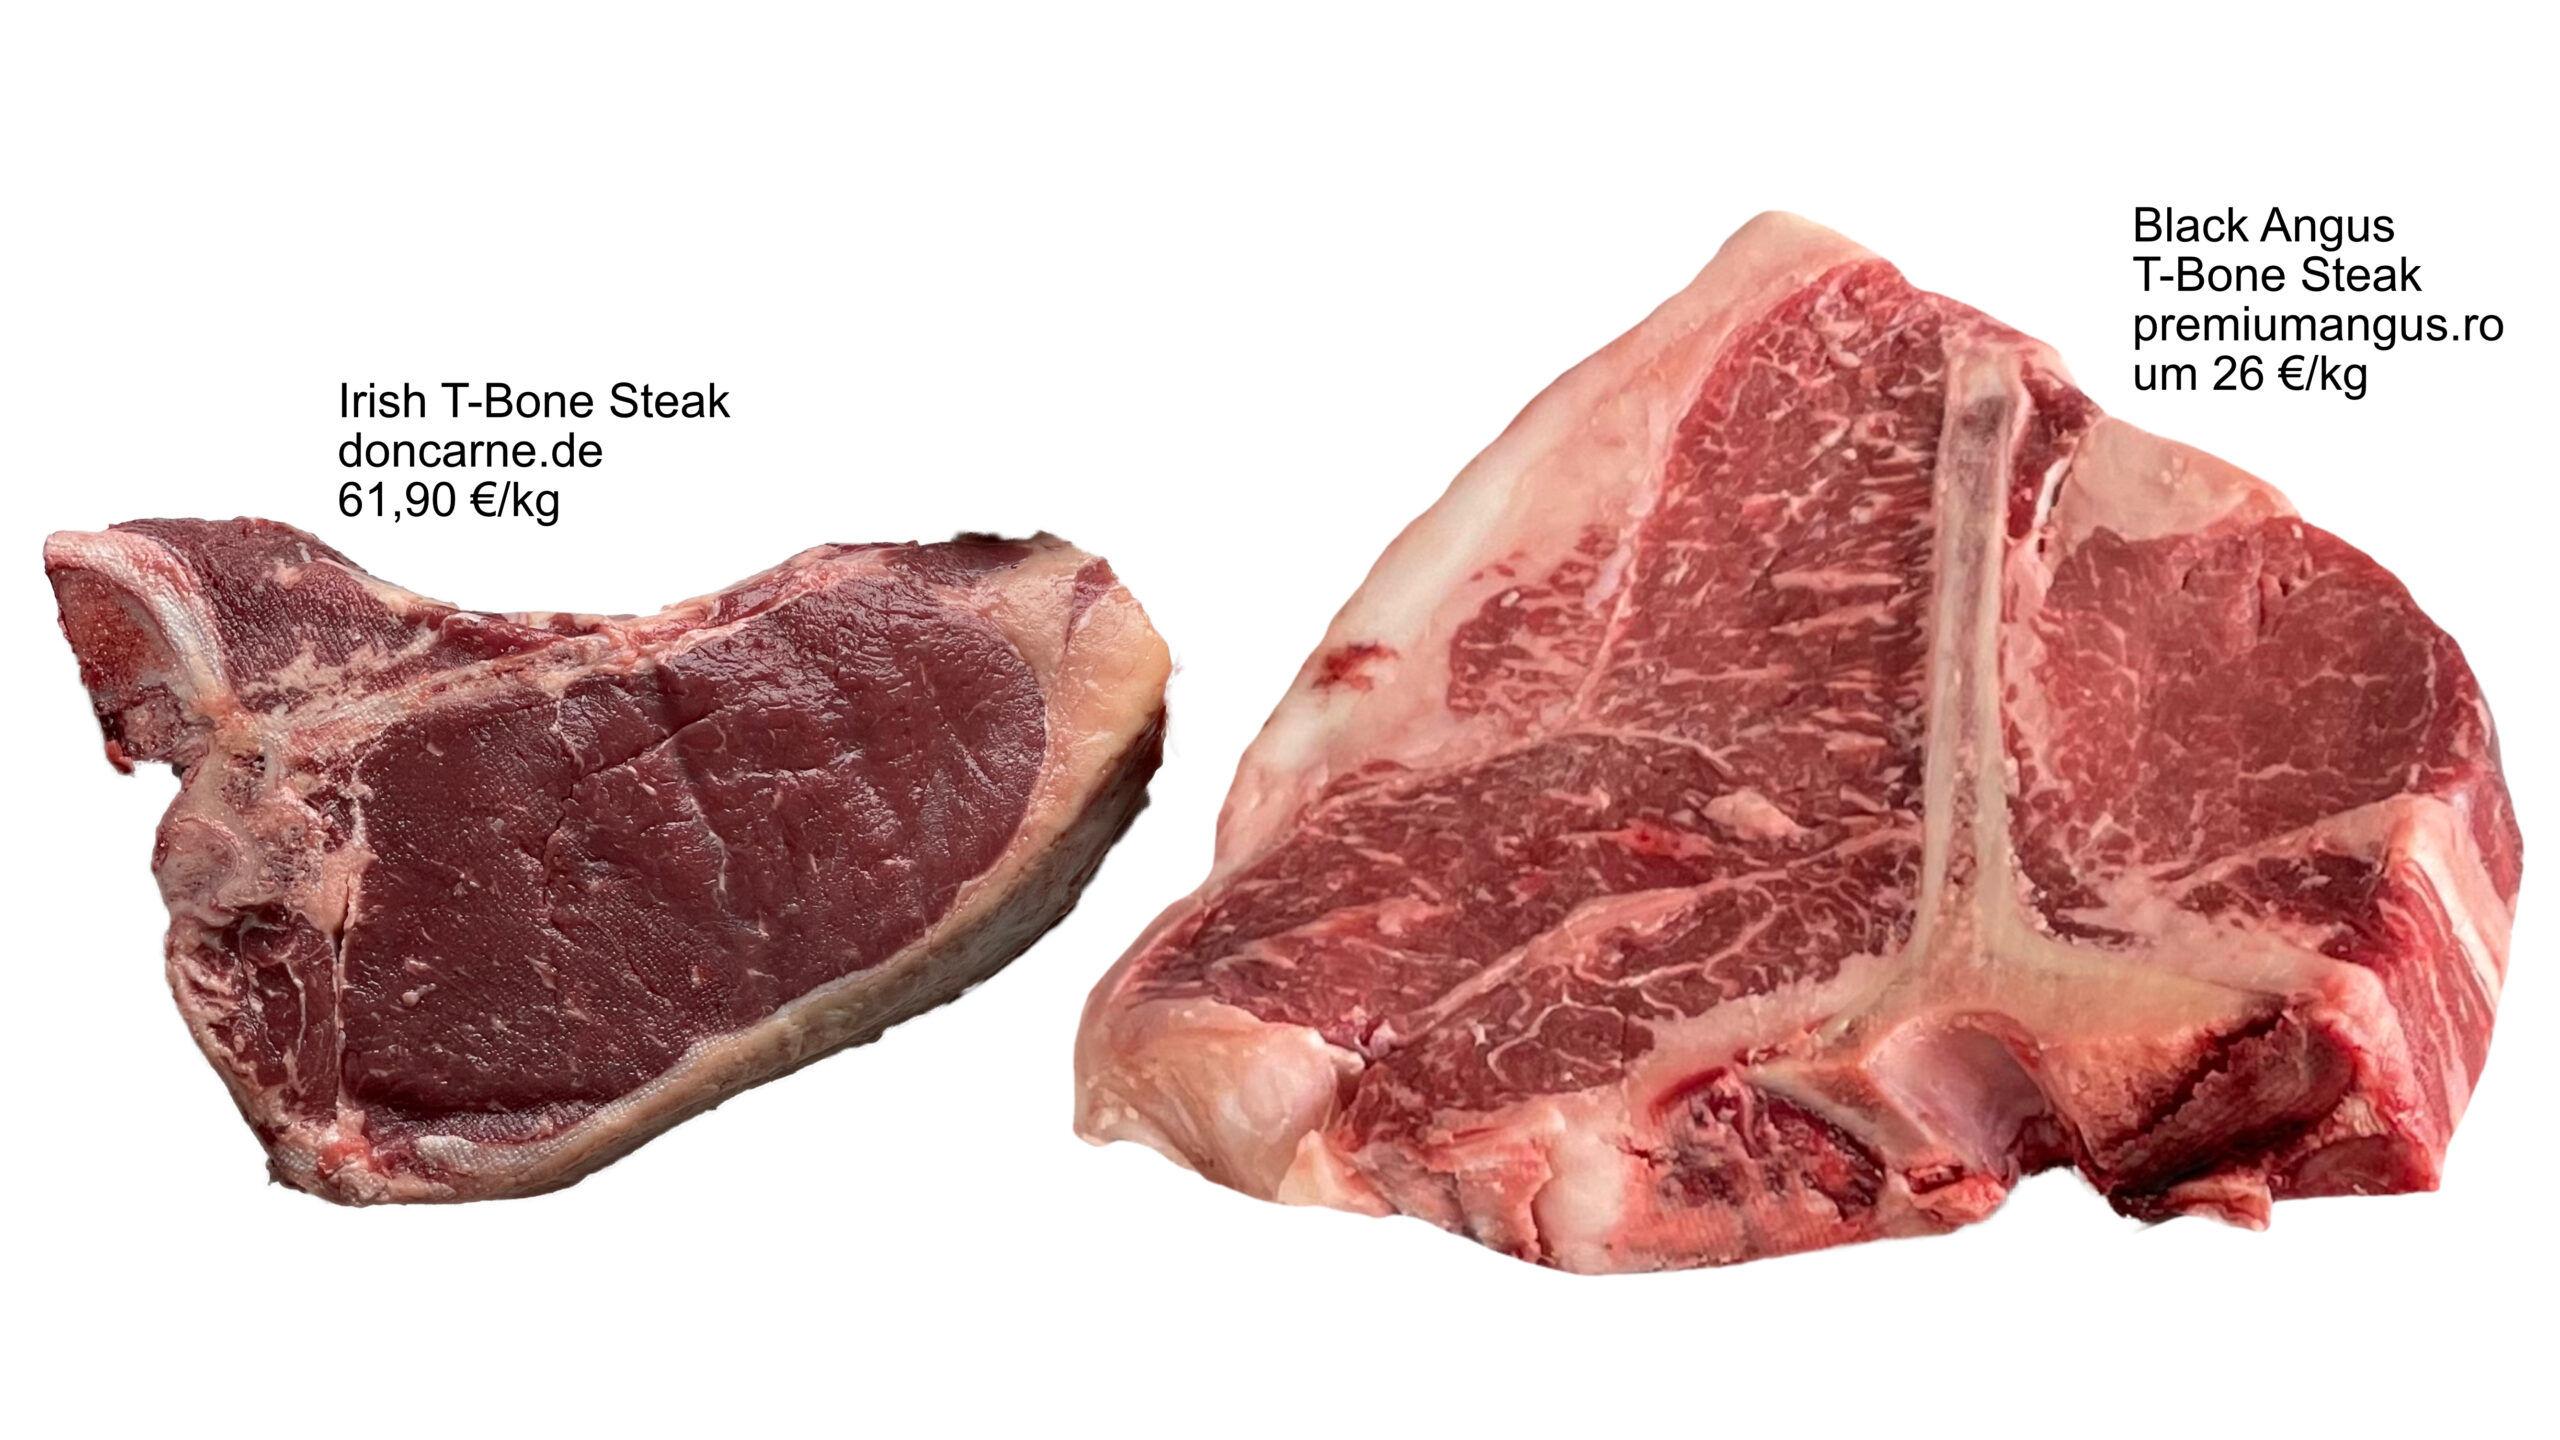 T-Bone Steaks doncarne.de vs. premiumangus.ro